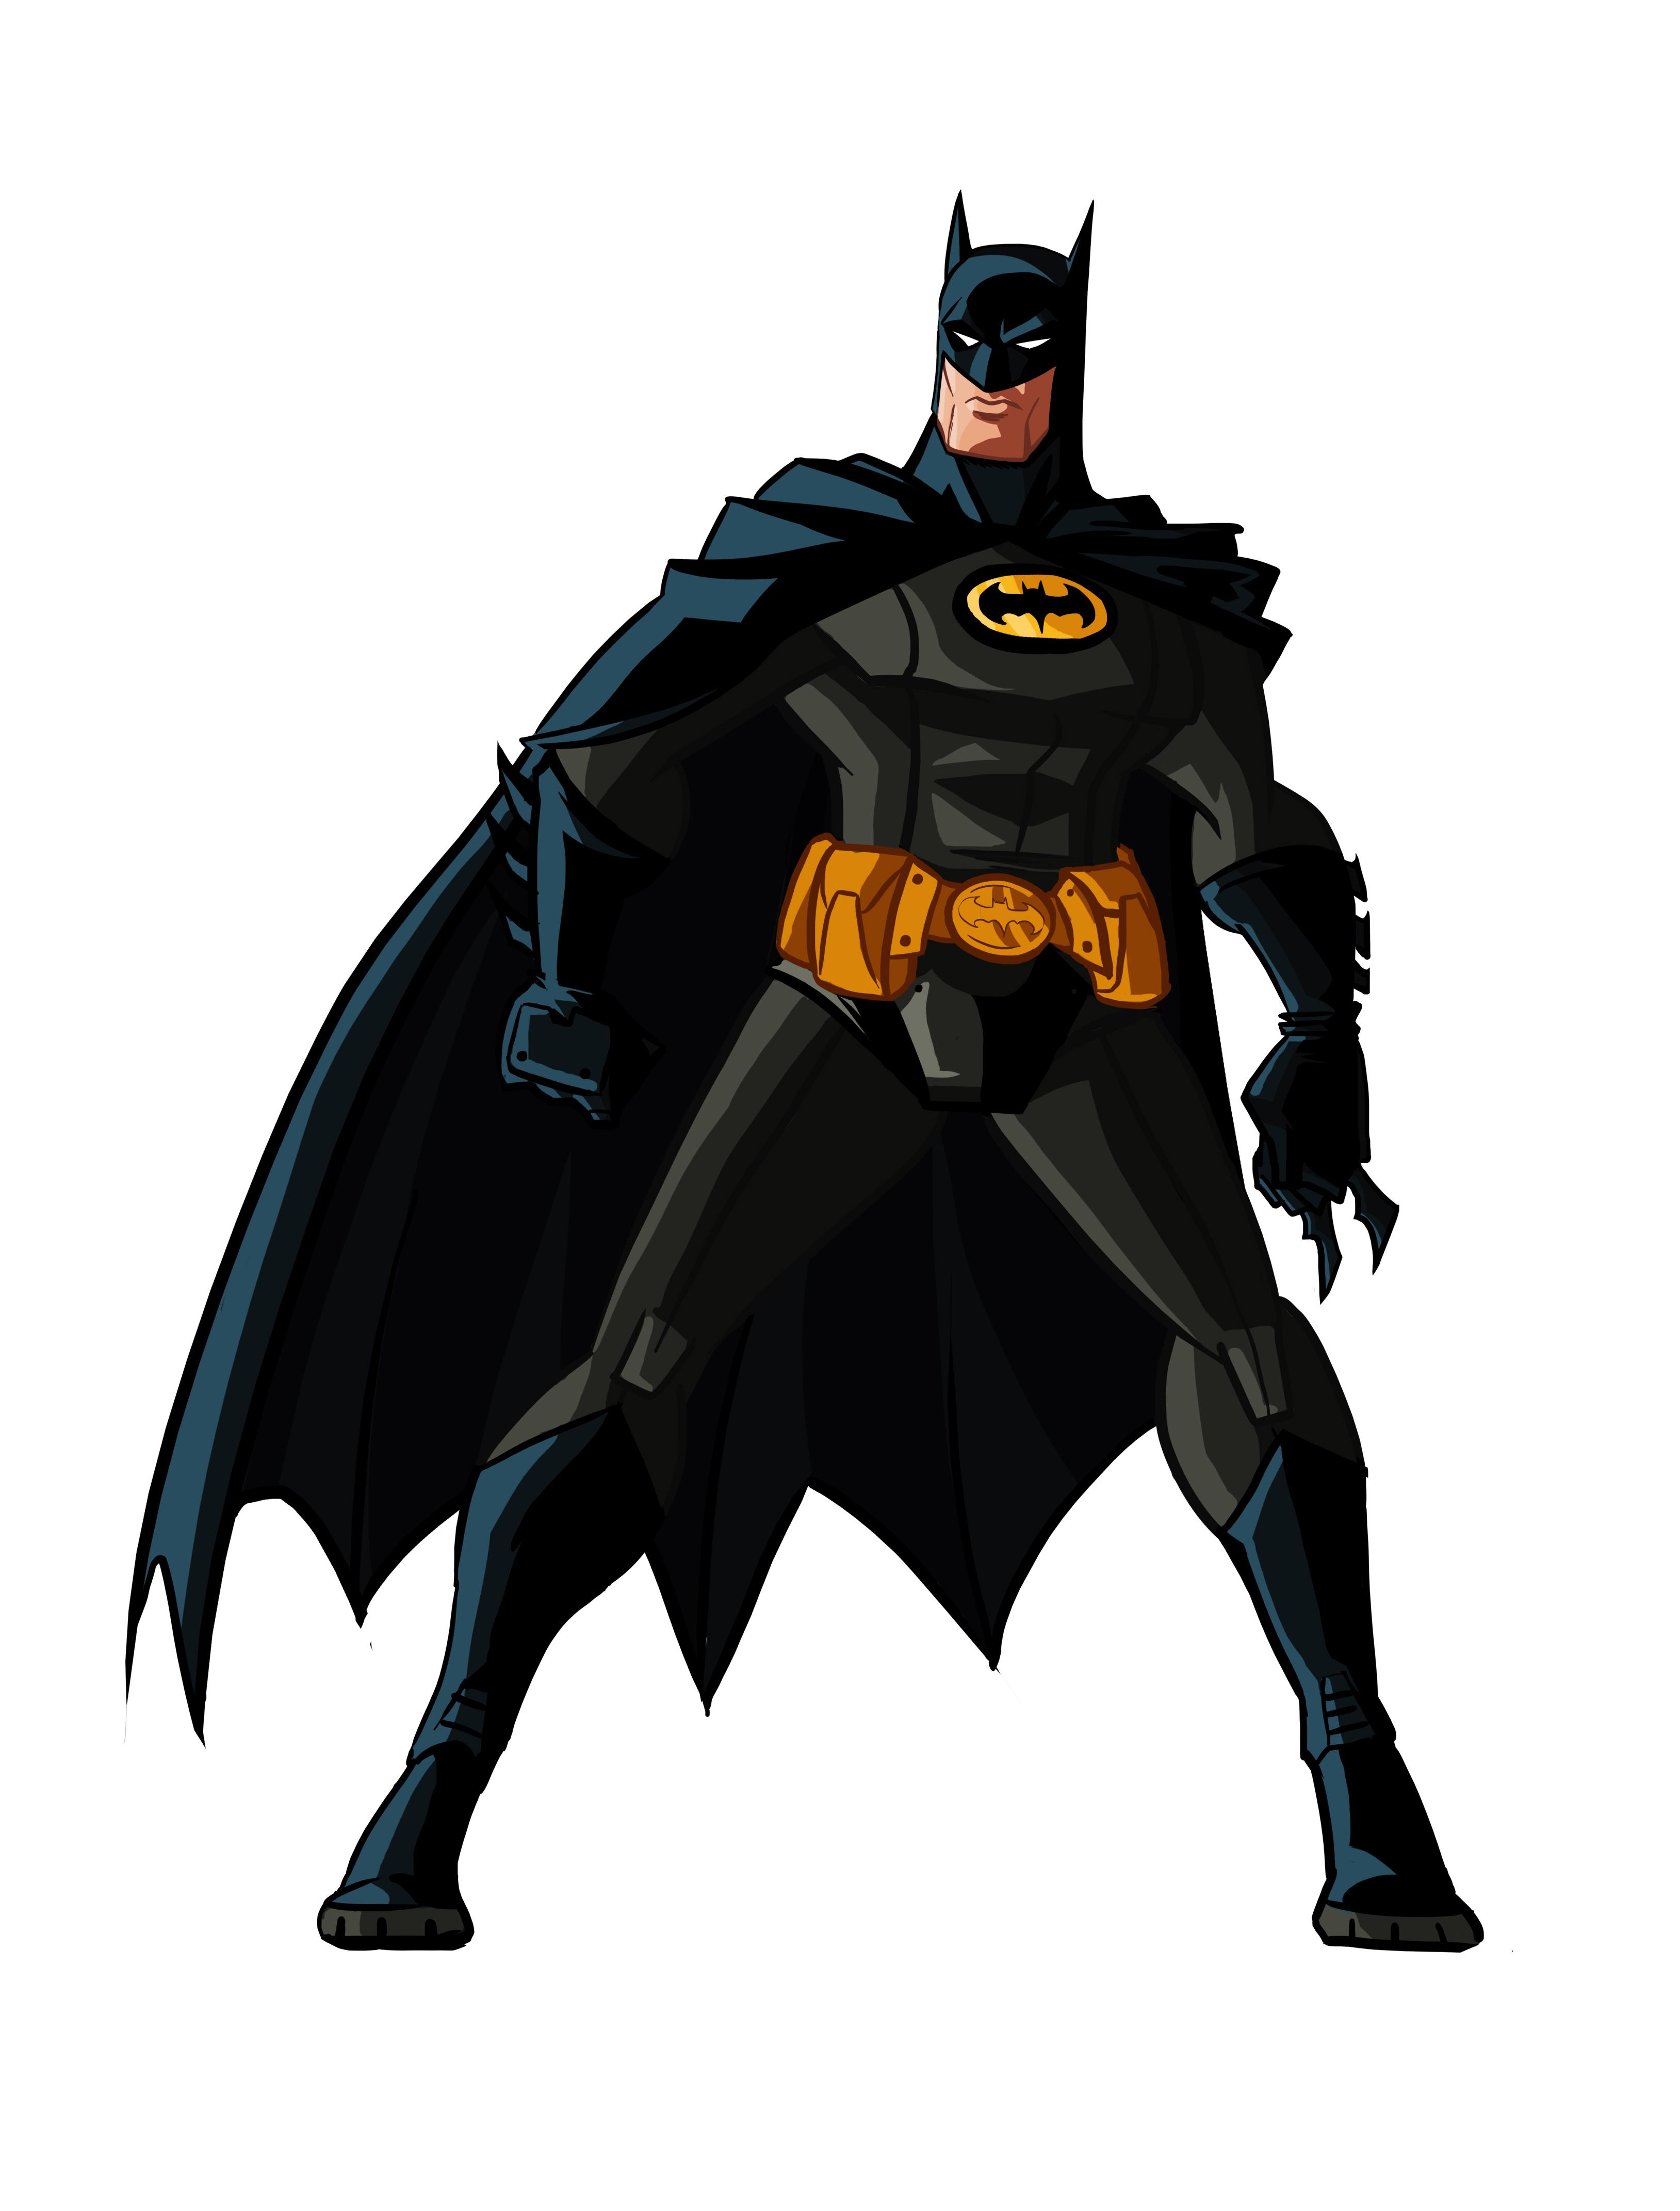 Batman clipart #1, Download drawings